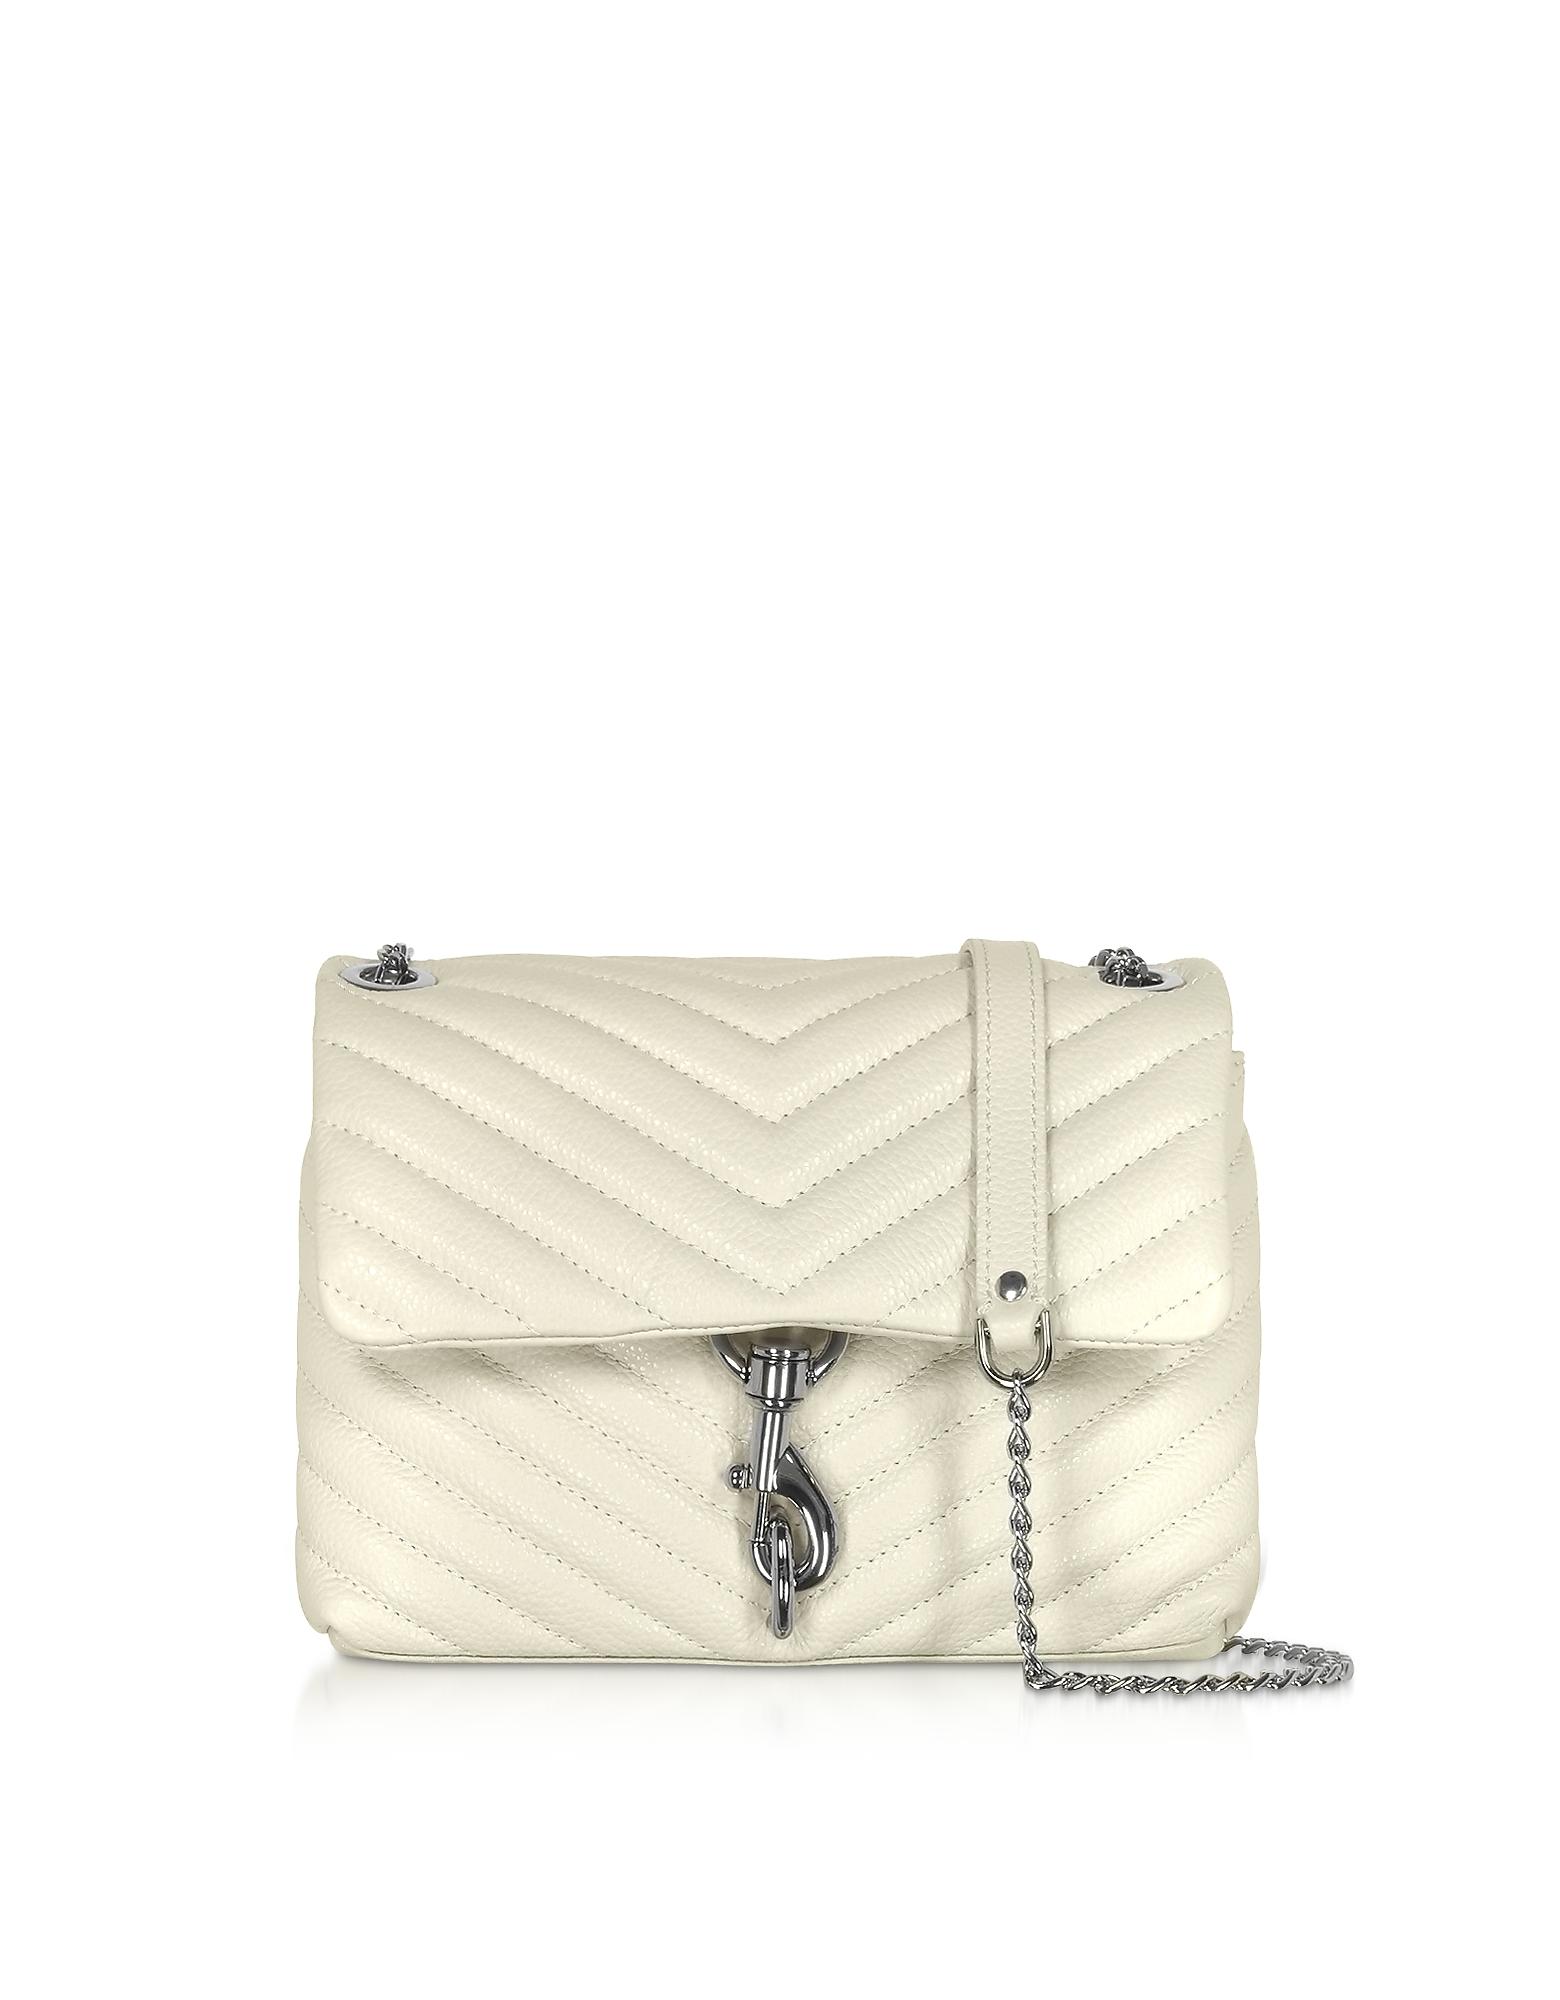 Rebecca Minkoff Designer Handbags, Quilted Leather Edie Xbody Bag